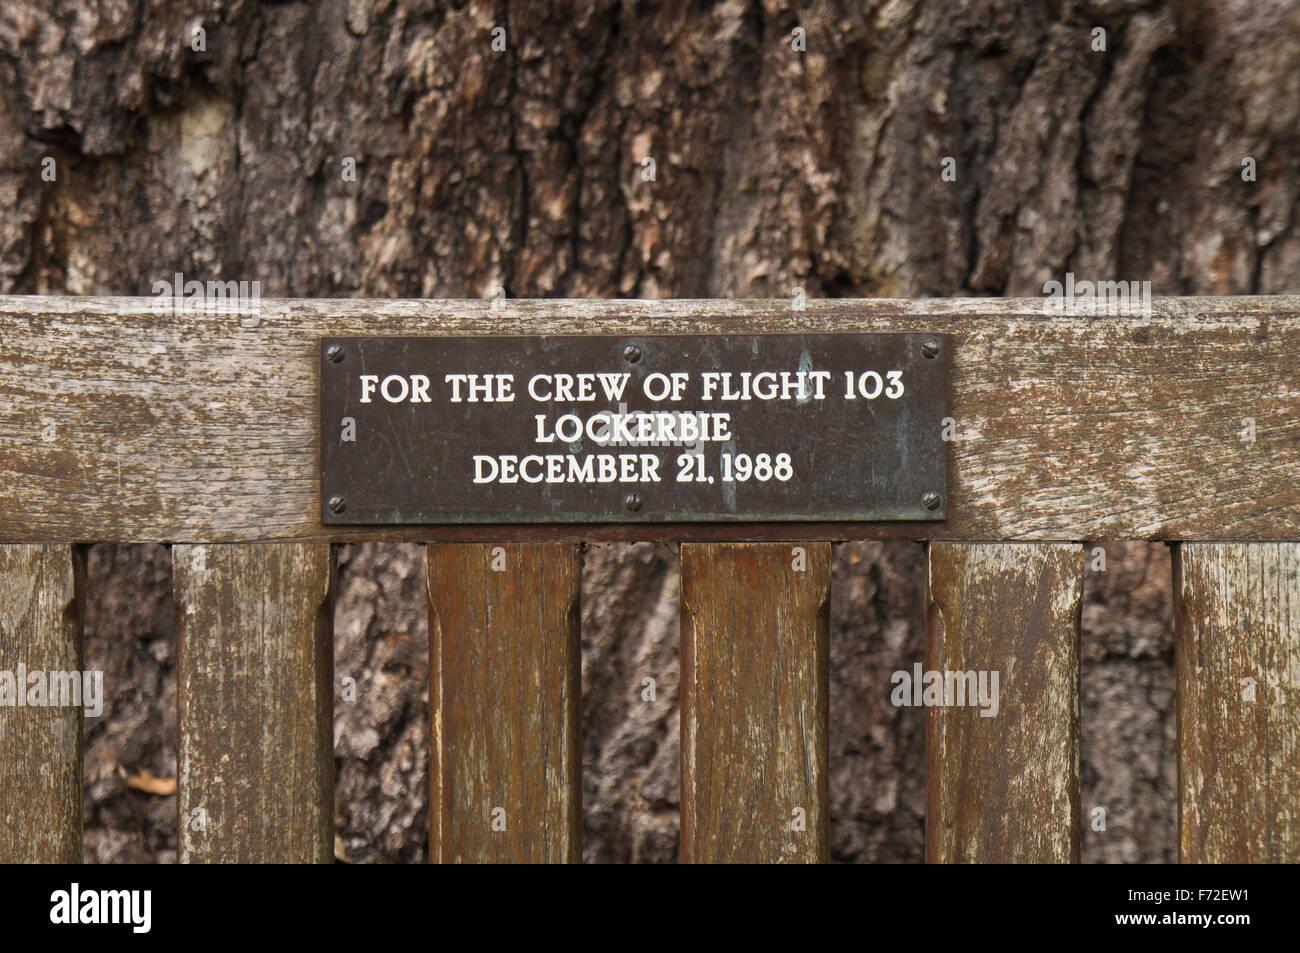 Lockerbie PanAm103 In Rememberance Memorial Benches round tree, Kew Gardens Stock Photo